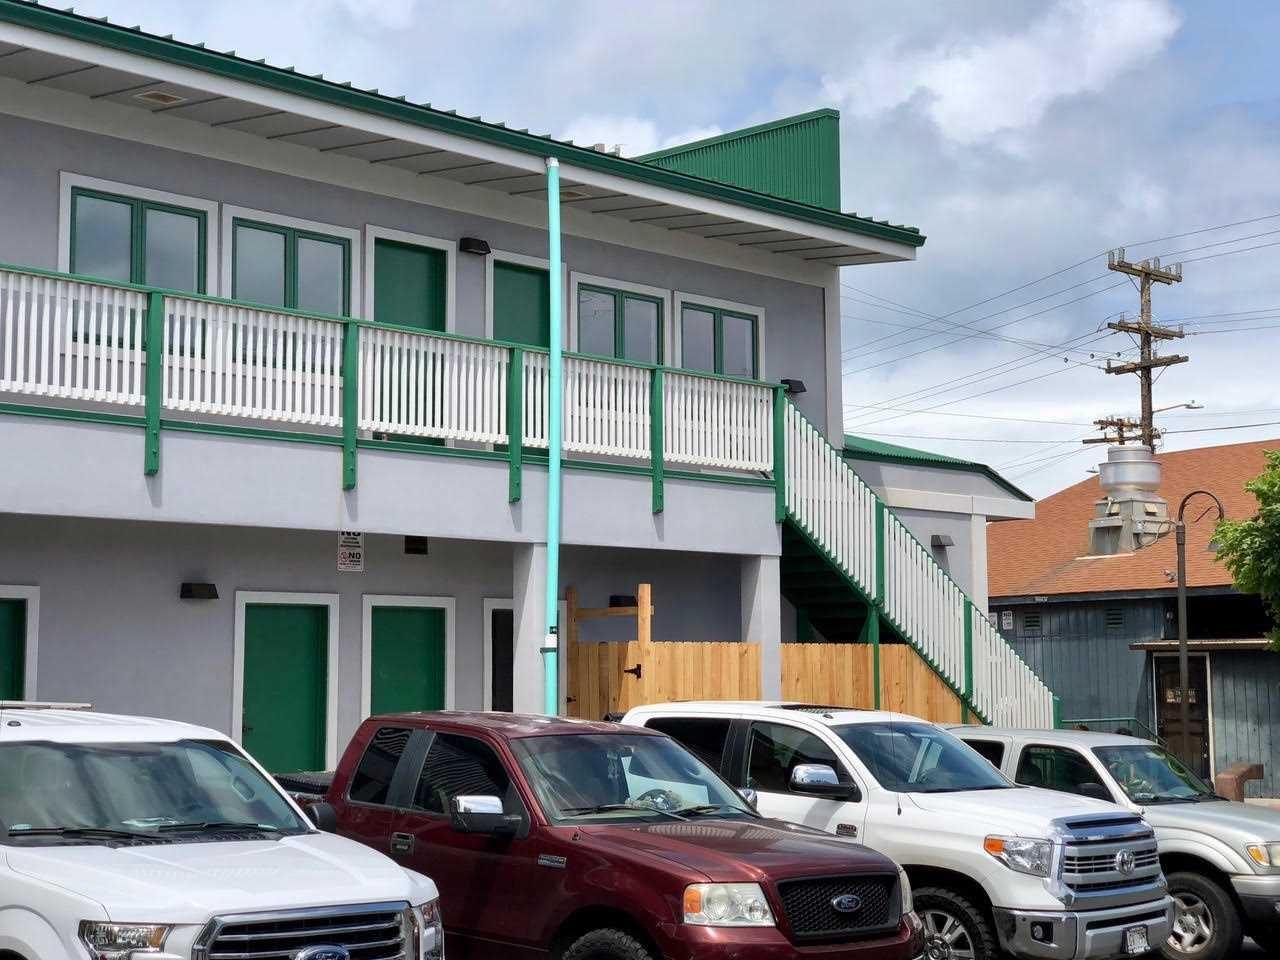 Photo of 120 Hana Hwy #Paia Town Center, Paia, HI 96779 (MLS # 378806)